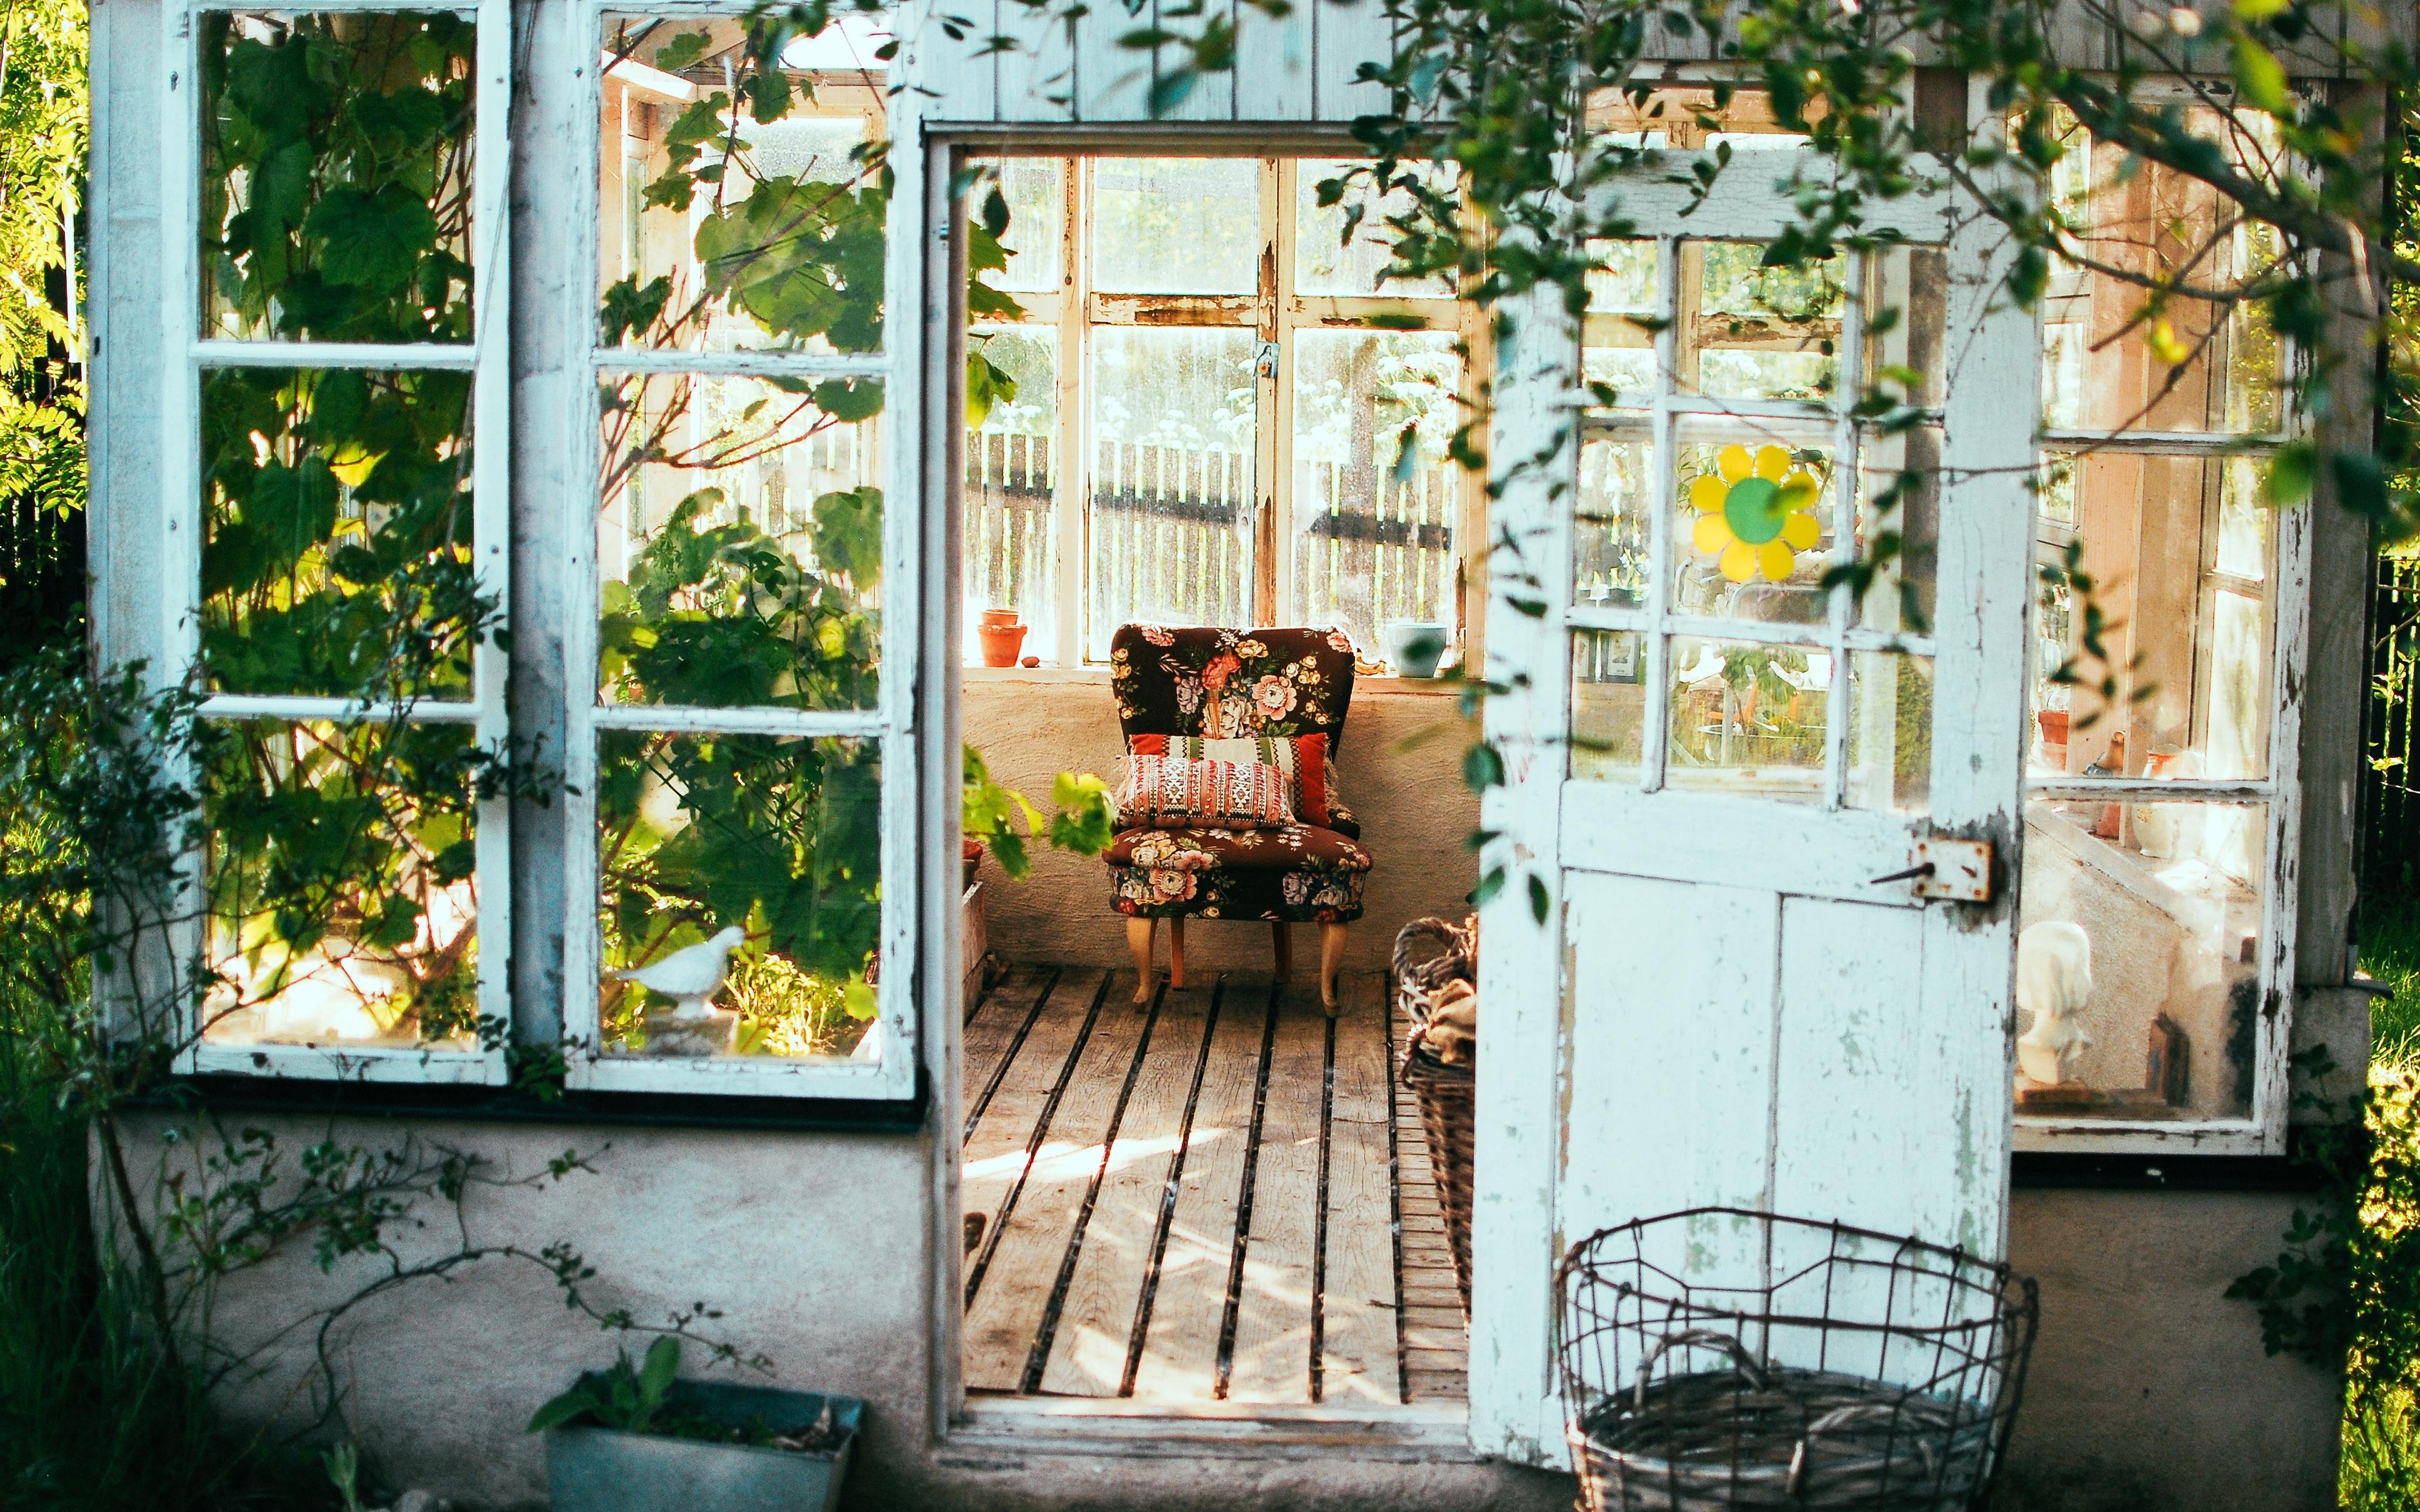 Kursi Pondok Dipan Gaya Country Desain Interior Cahaya Pedesaan Sofa Lantai Kayu